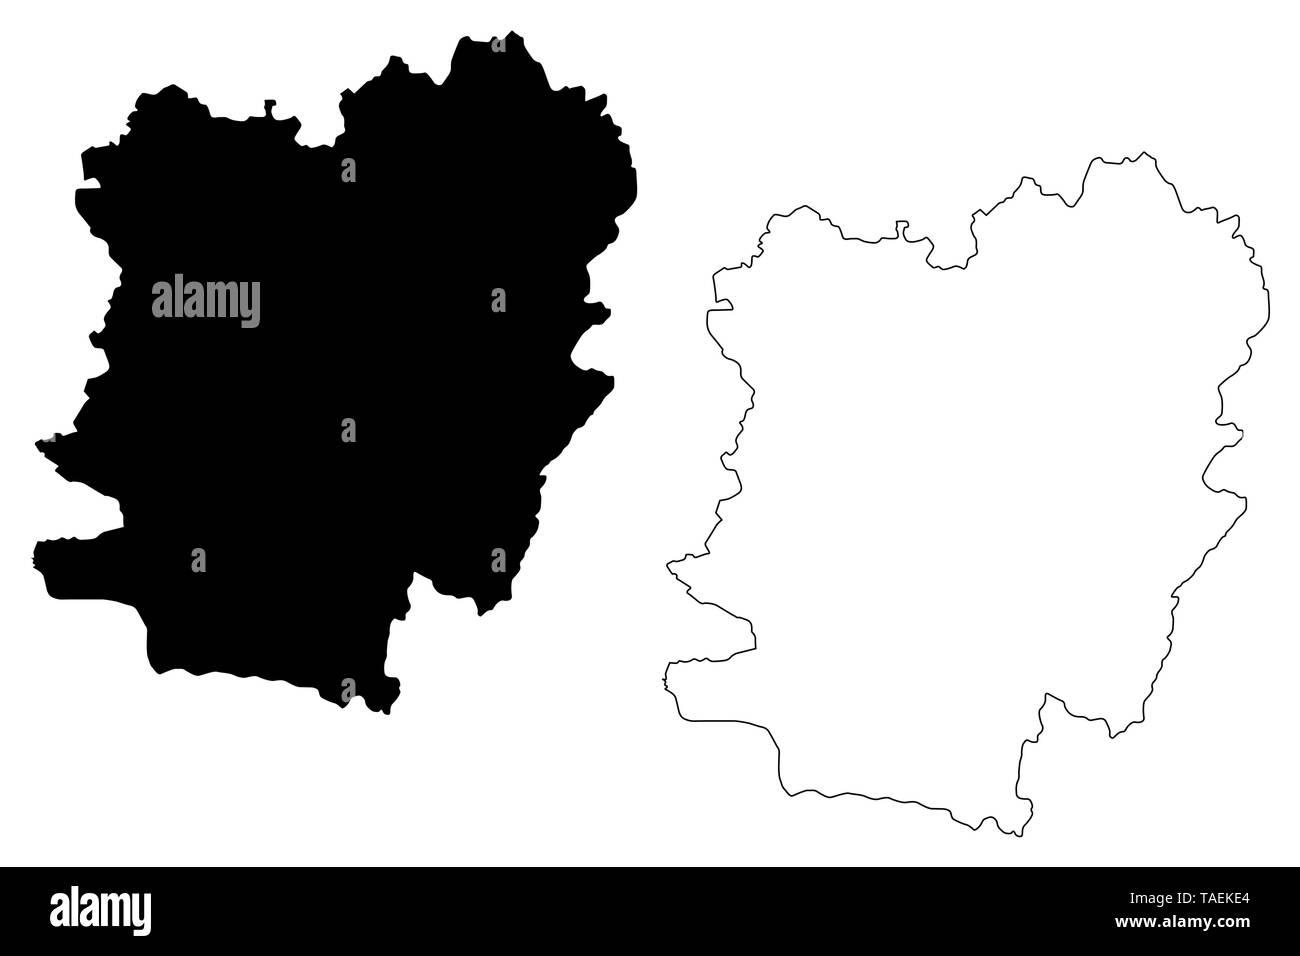 Caras-Severin County (Administrative divisions of Romania, Vest development region) map vector illustration, scribble sketch Caras-Severin map - Stock Image